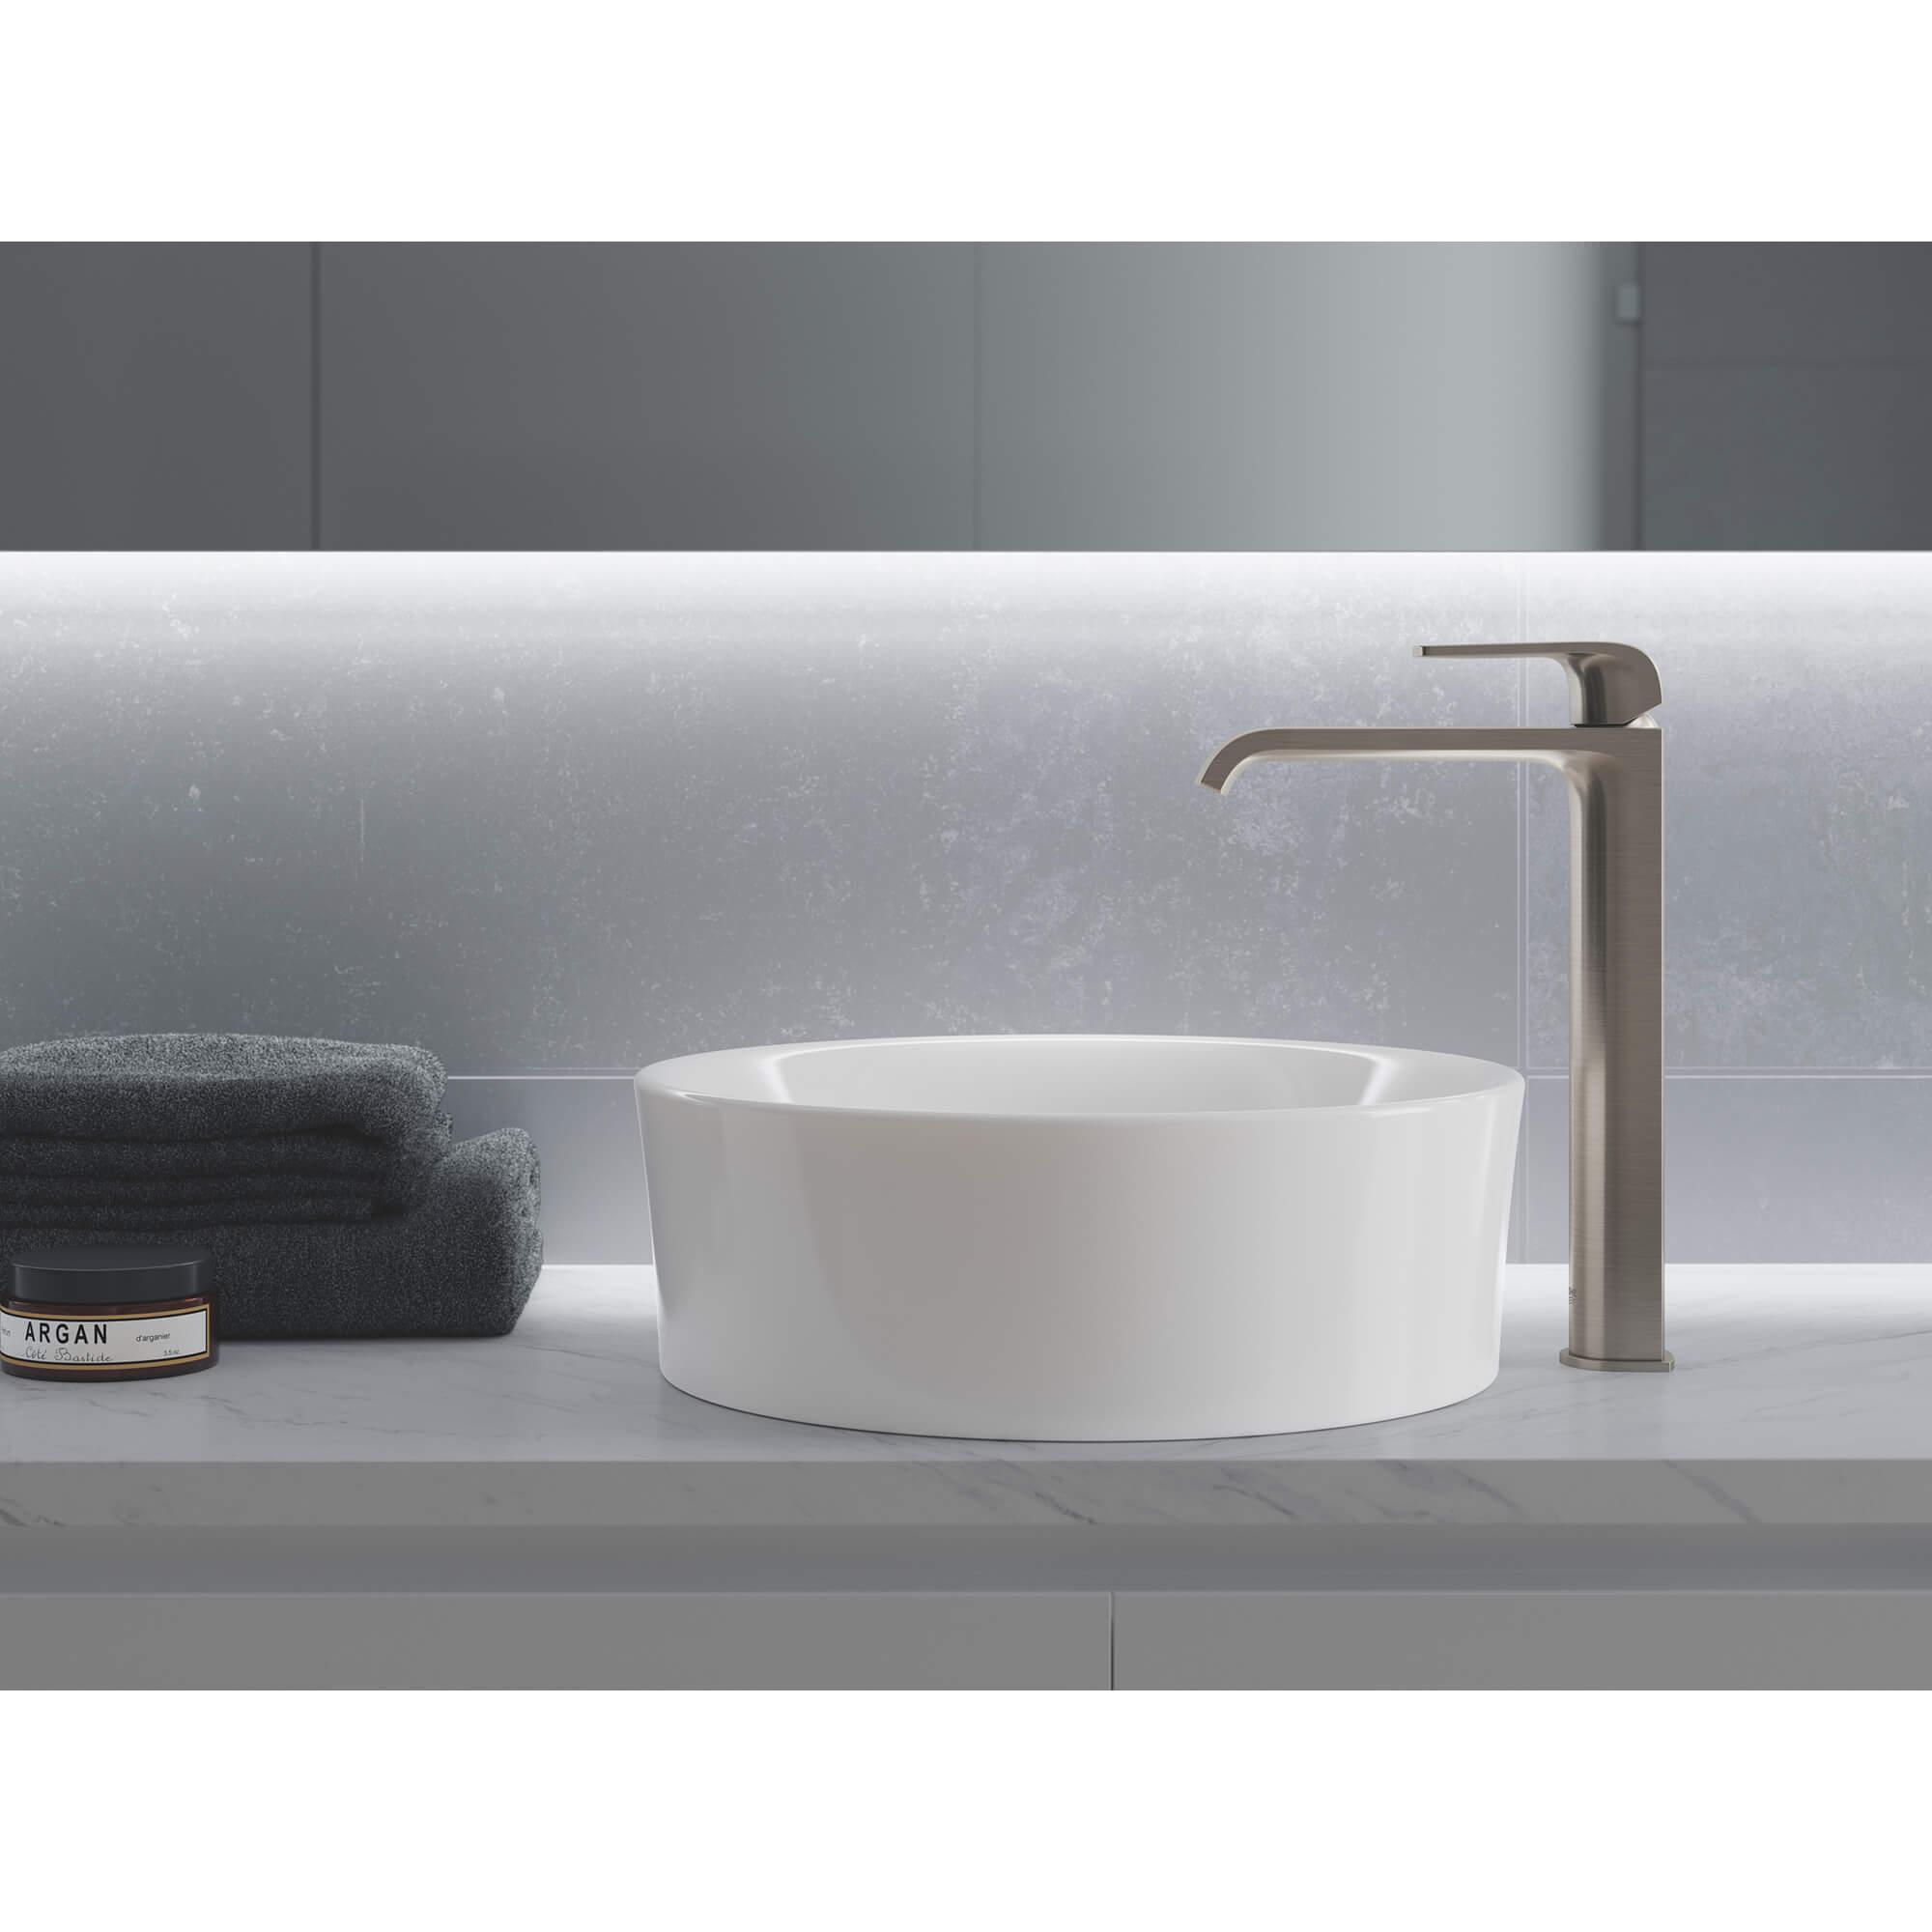 single hole single handle deck mount vessel sink faucet 4 5 l min 1 2 gpm